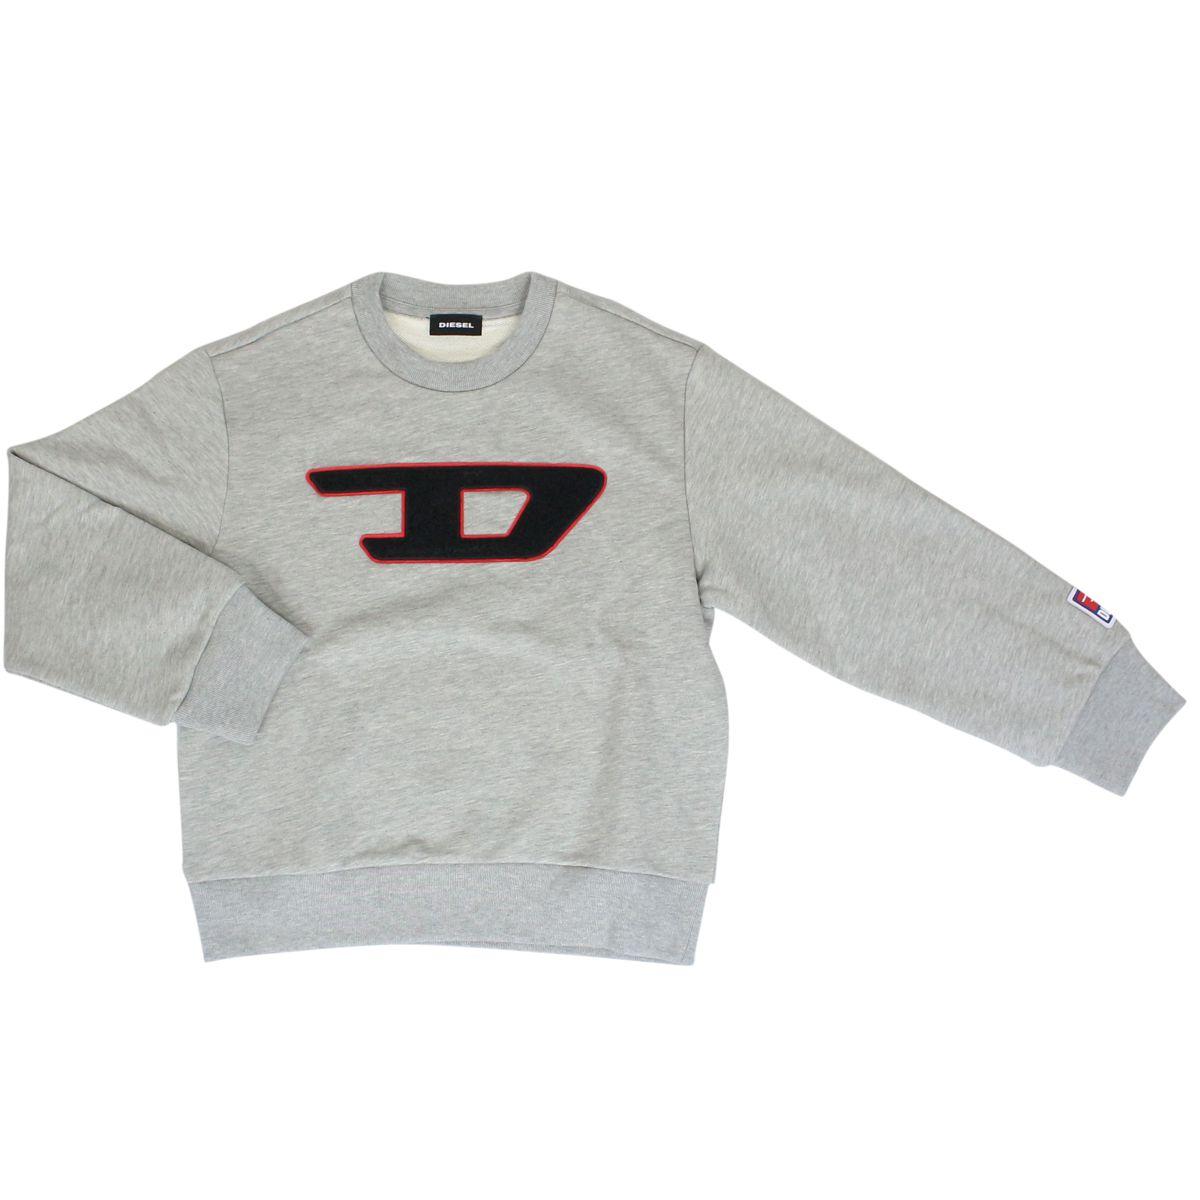 Cotton sweatshirt with sponge patch Grey Diesel